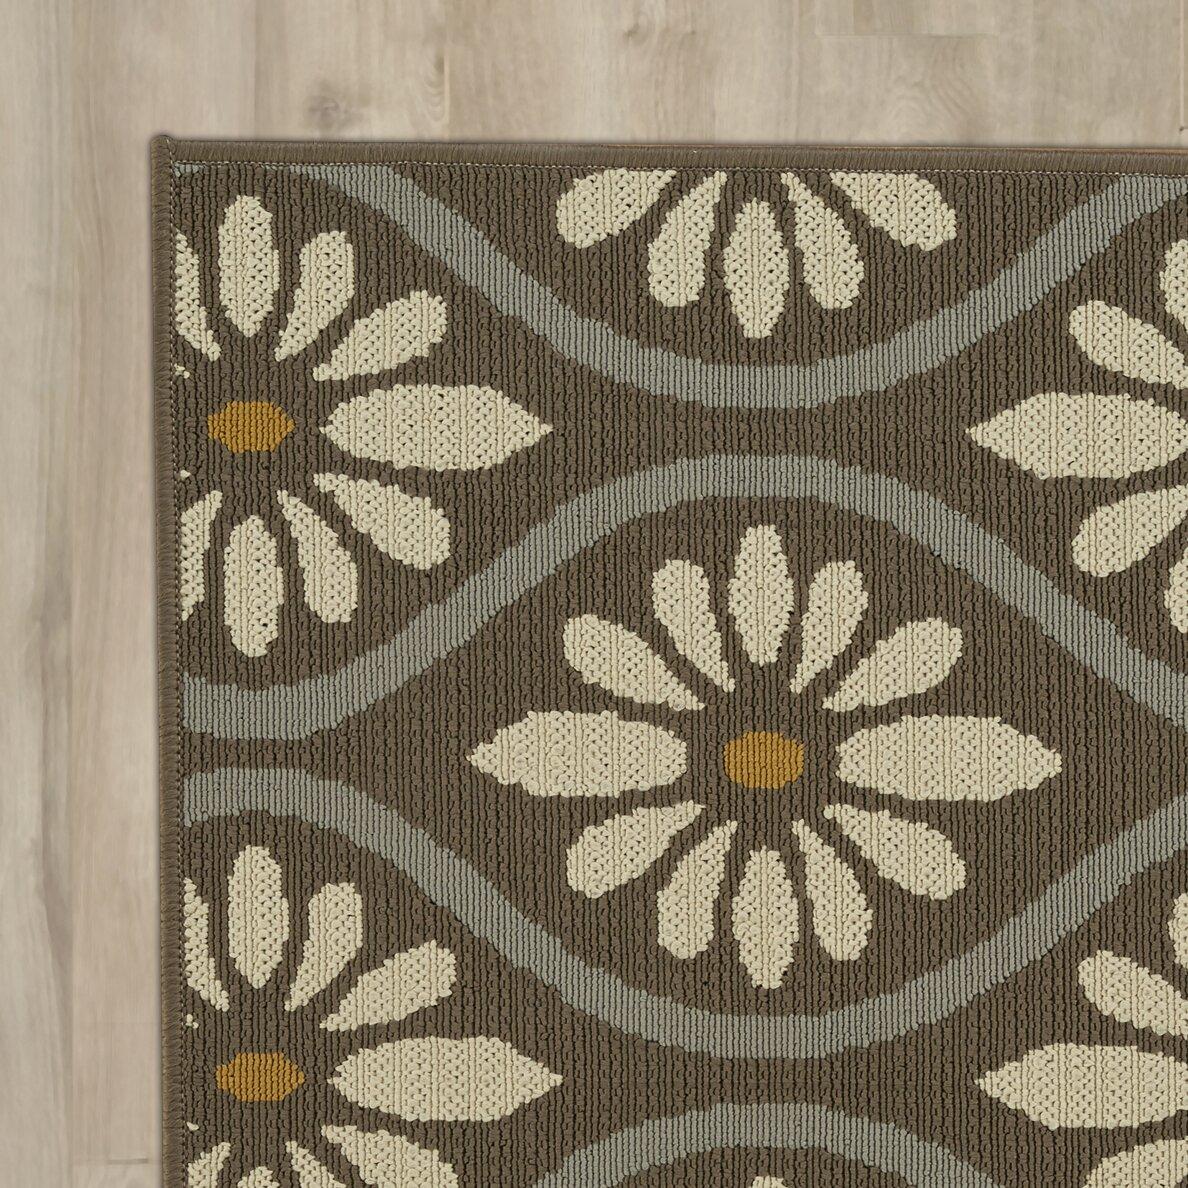 Riley ave remy grey indoor outdoor area rug reviews for Indoor outdoor rugs uk